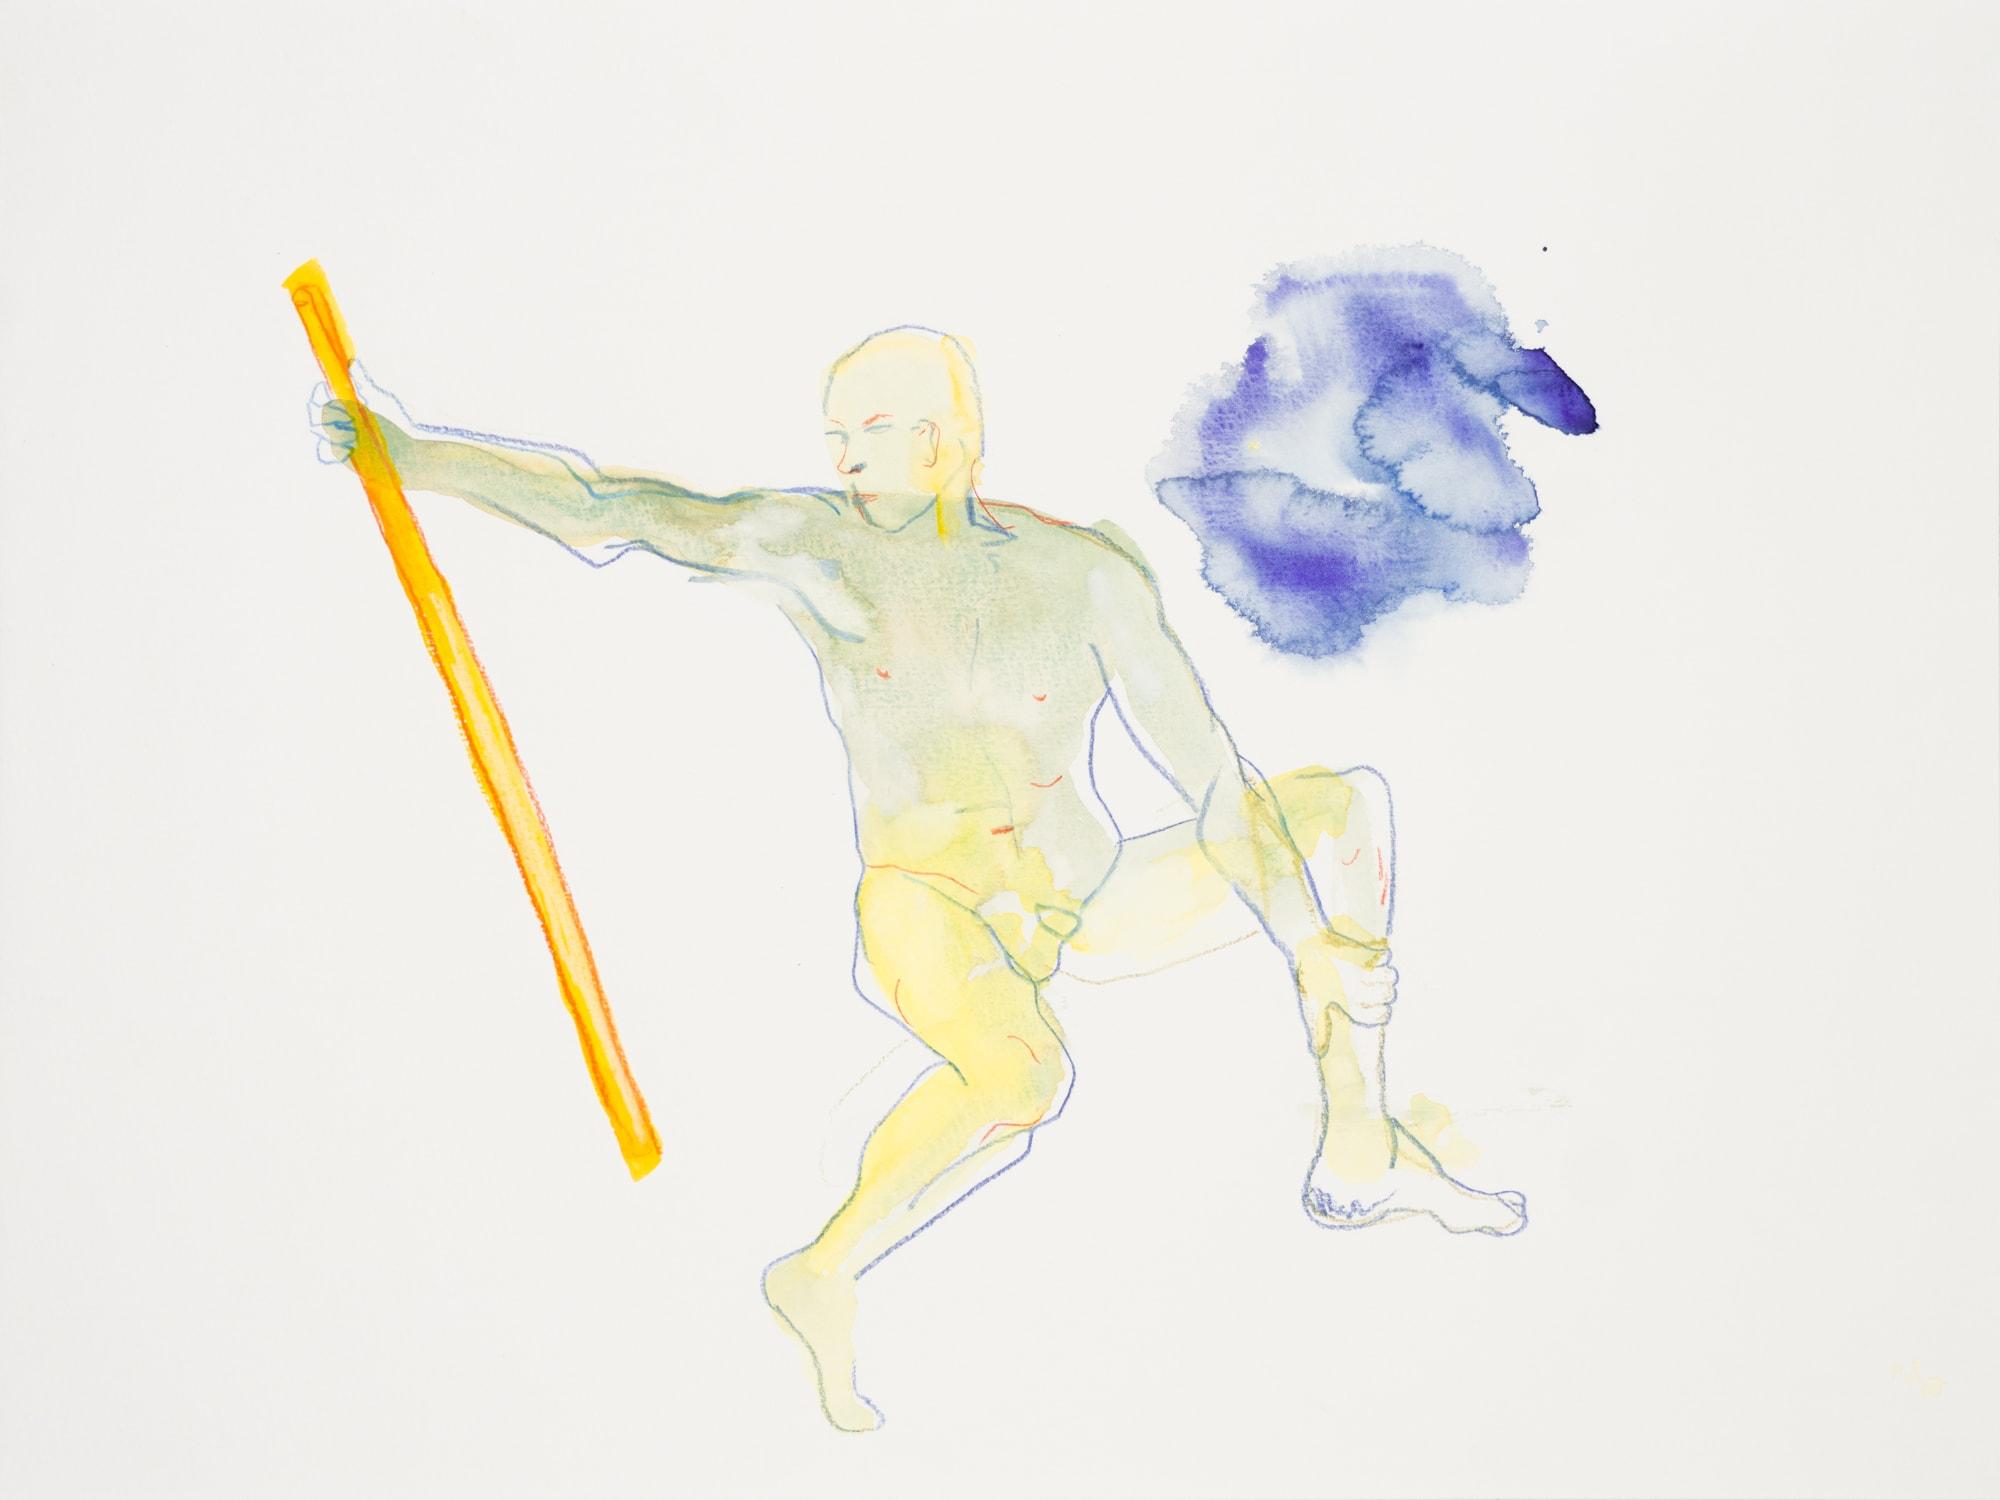 Mischtechnik, Aquarell und Farbstift auf Papier, 40cm x 30cm, Akt, artist: Franziska King